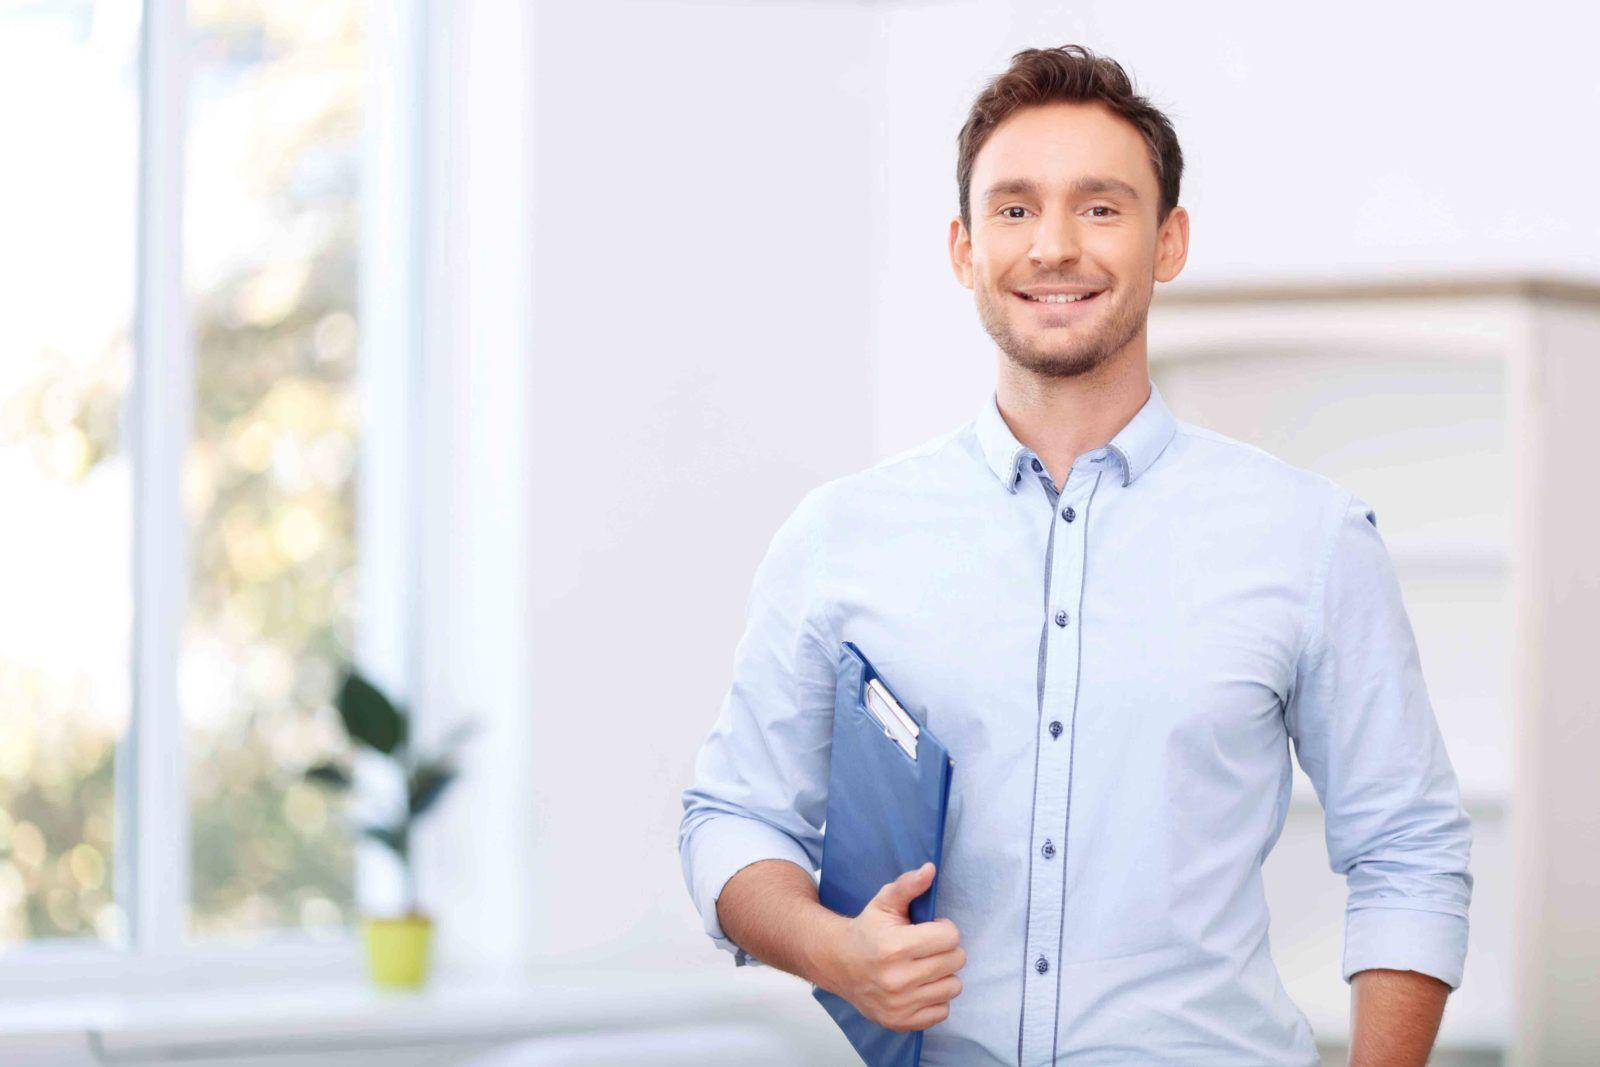 profesion agente inmobiliario